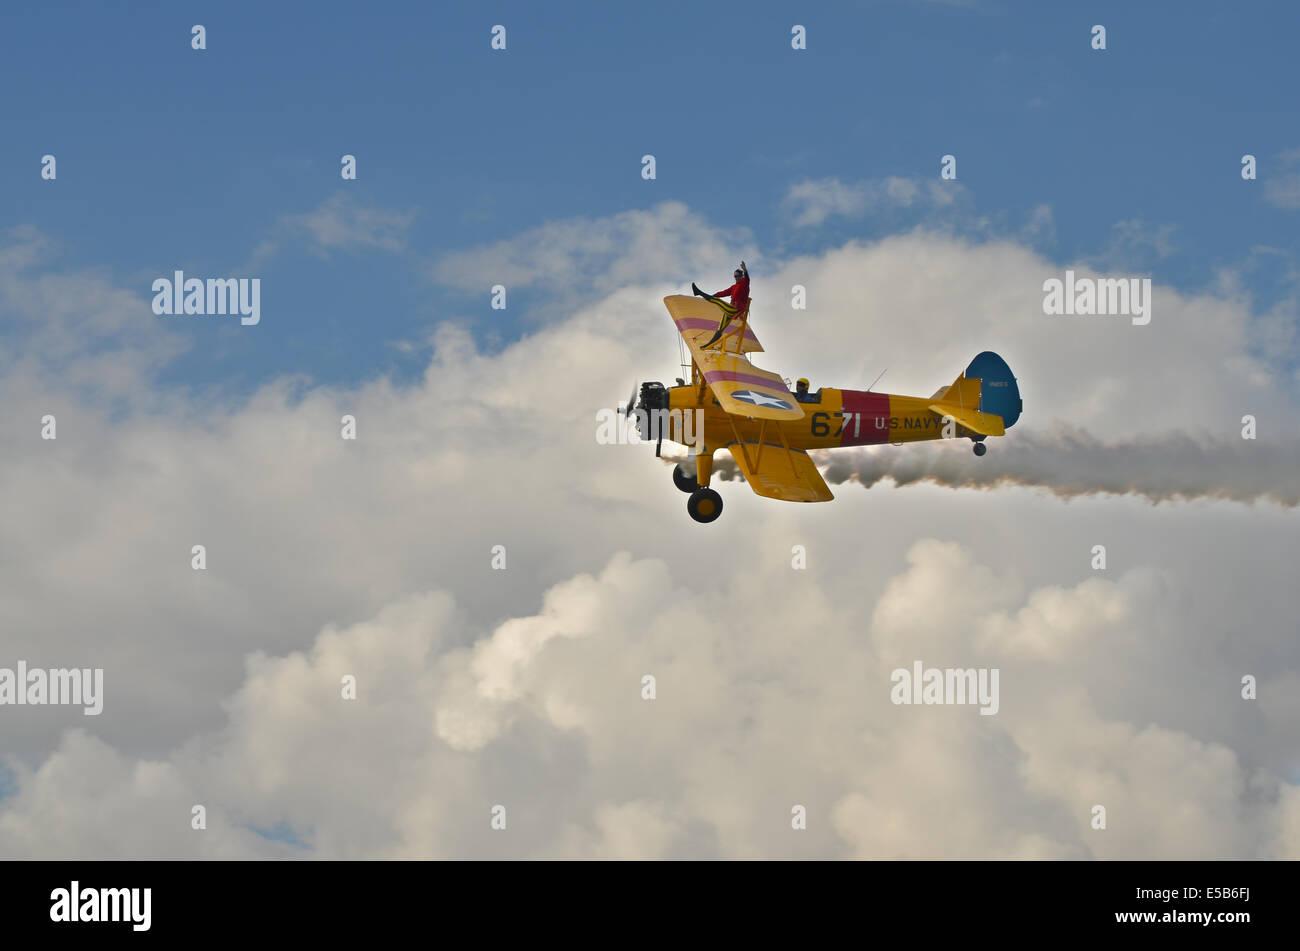 Wing walker on a yellow bi-plane - Stock Image